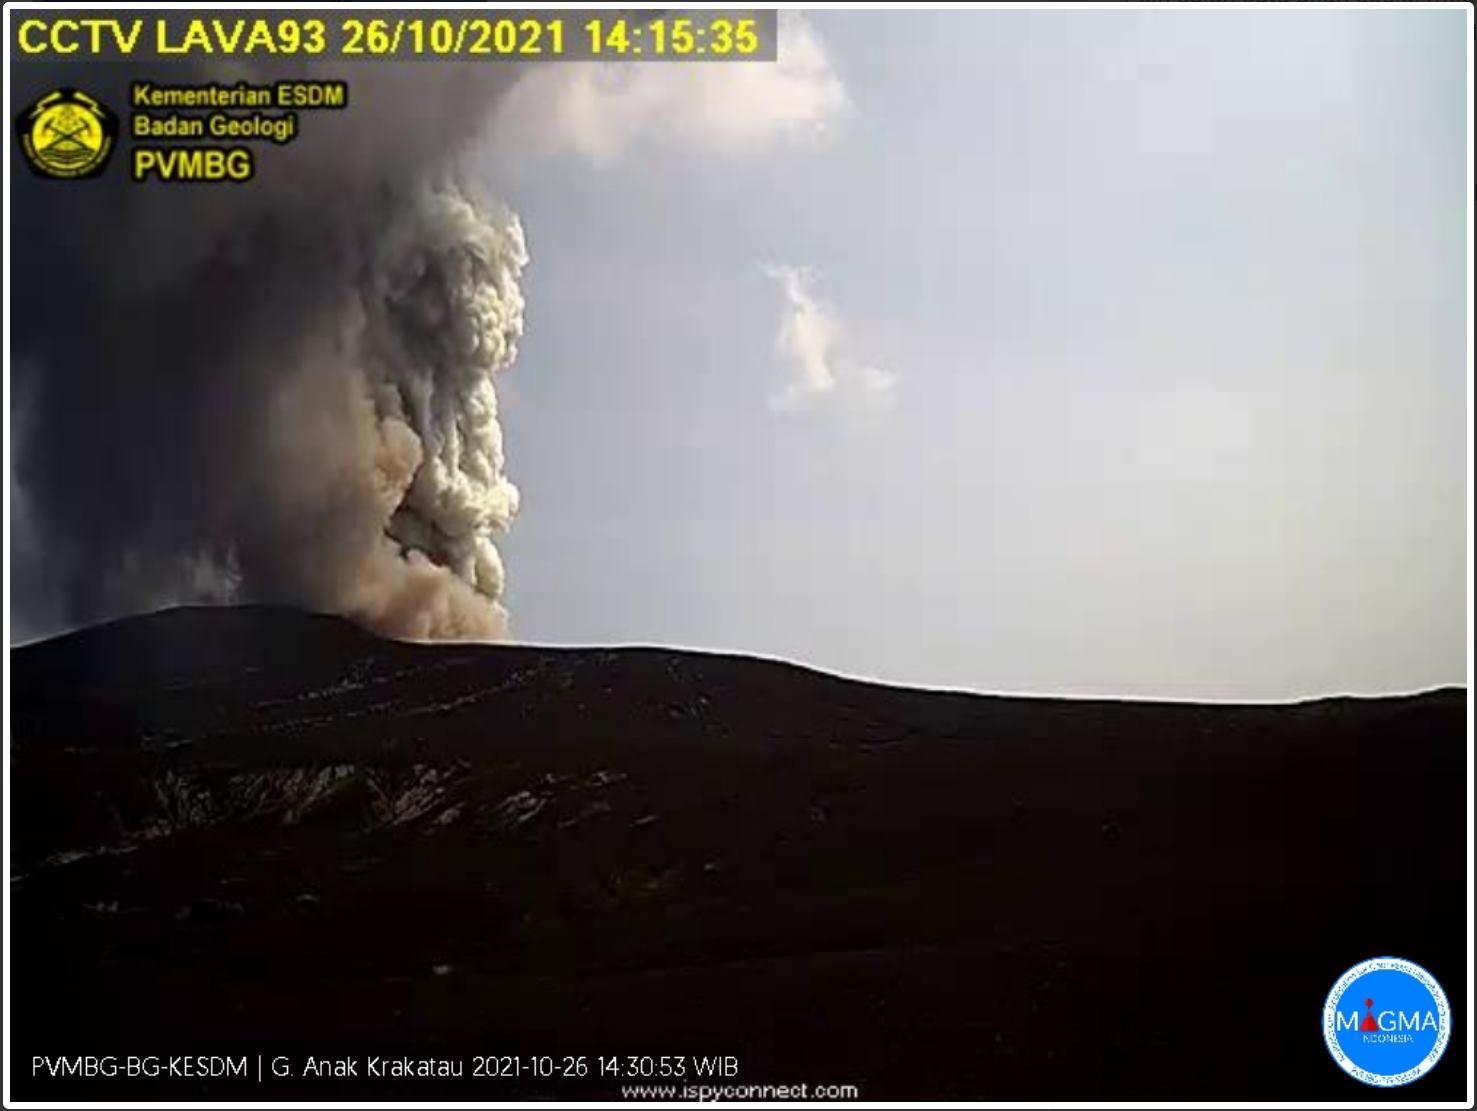 Eruption from Krakatau yesterday (image: PVMBG)